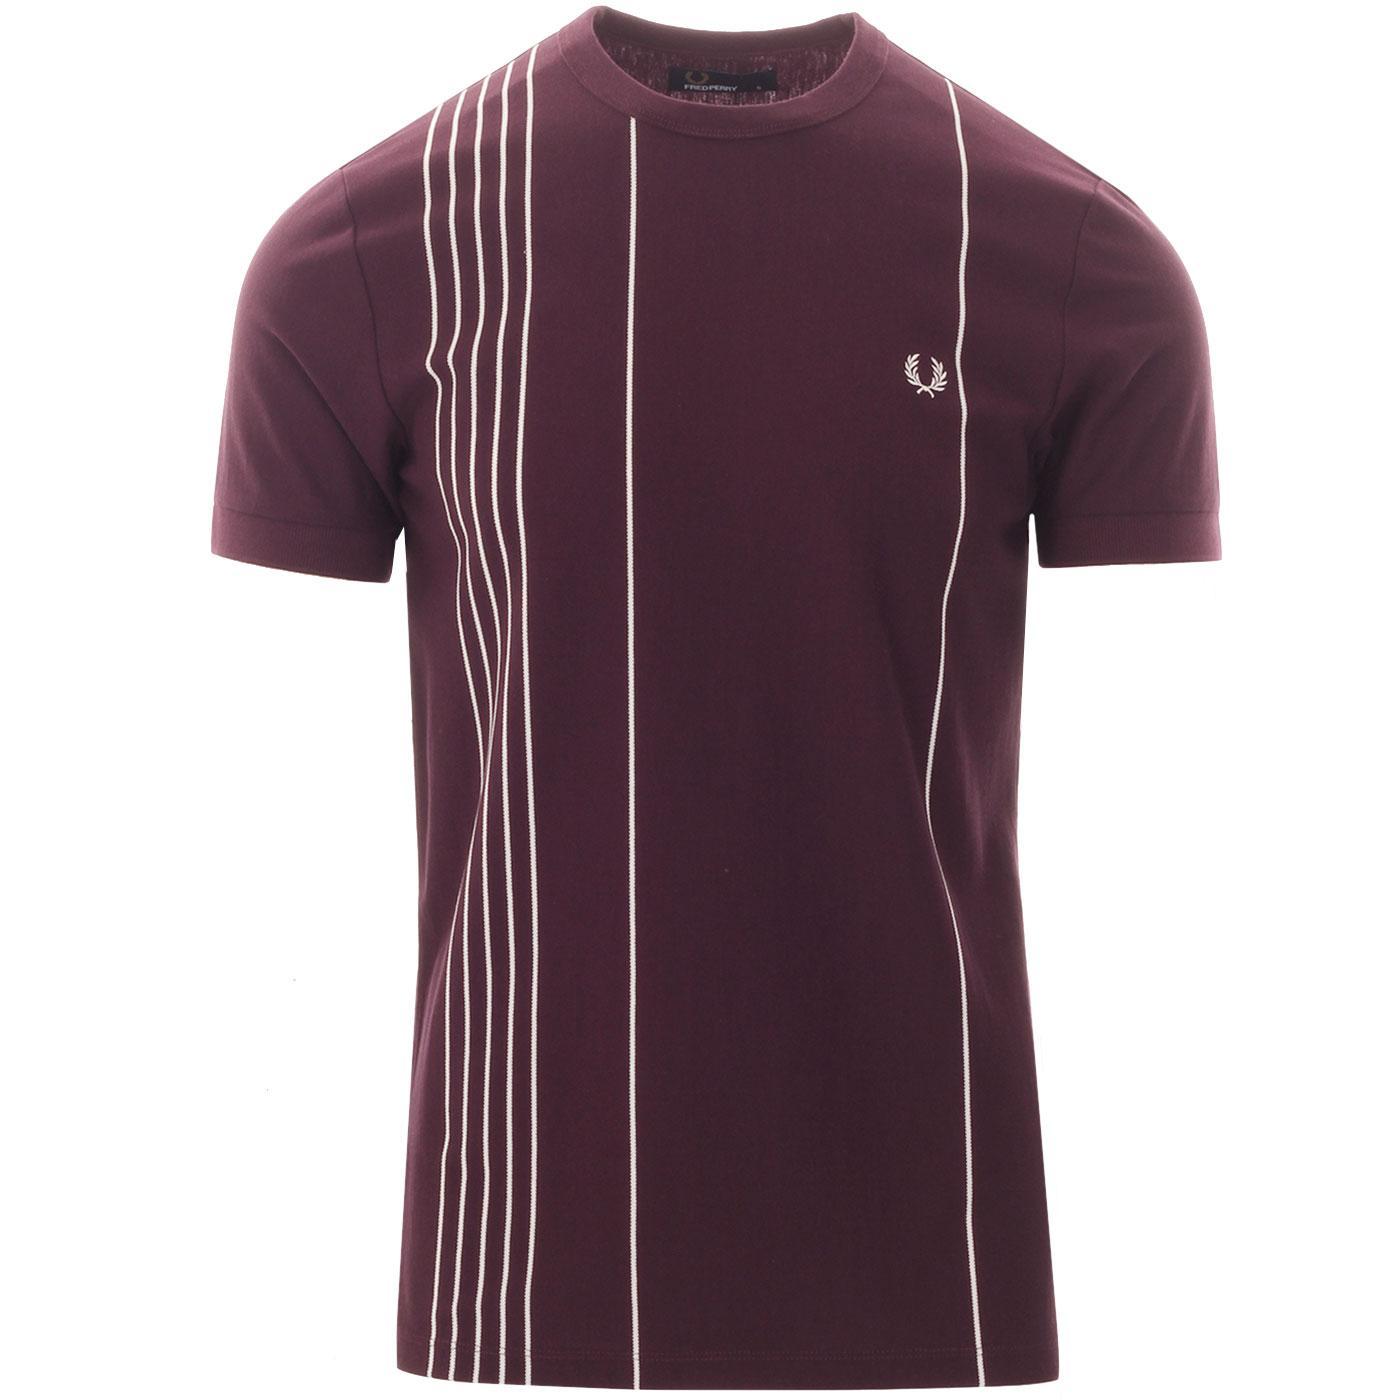 FRED PERRY Men's Vertical Stripe Pique T-Shirt